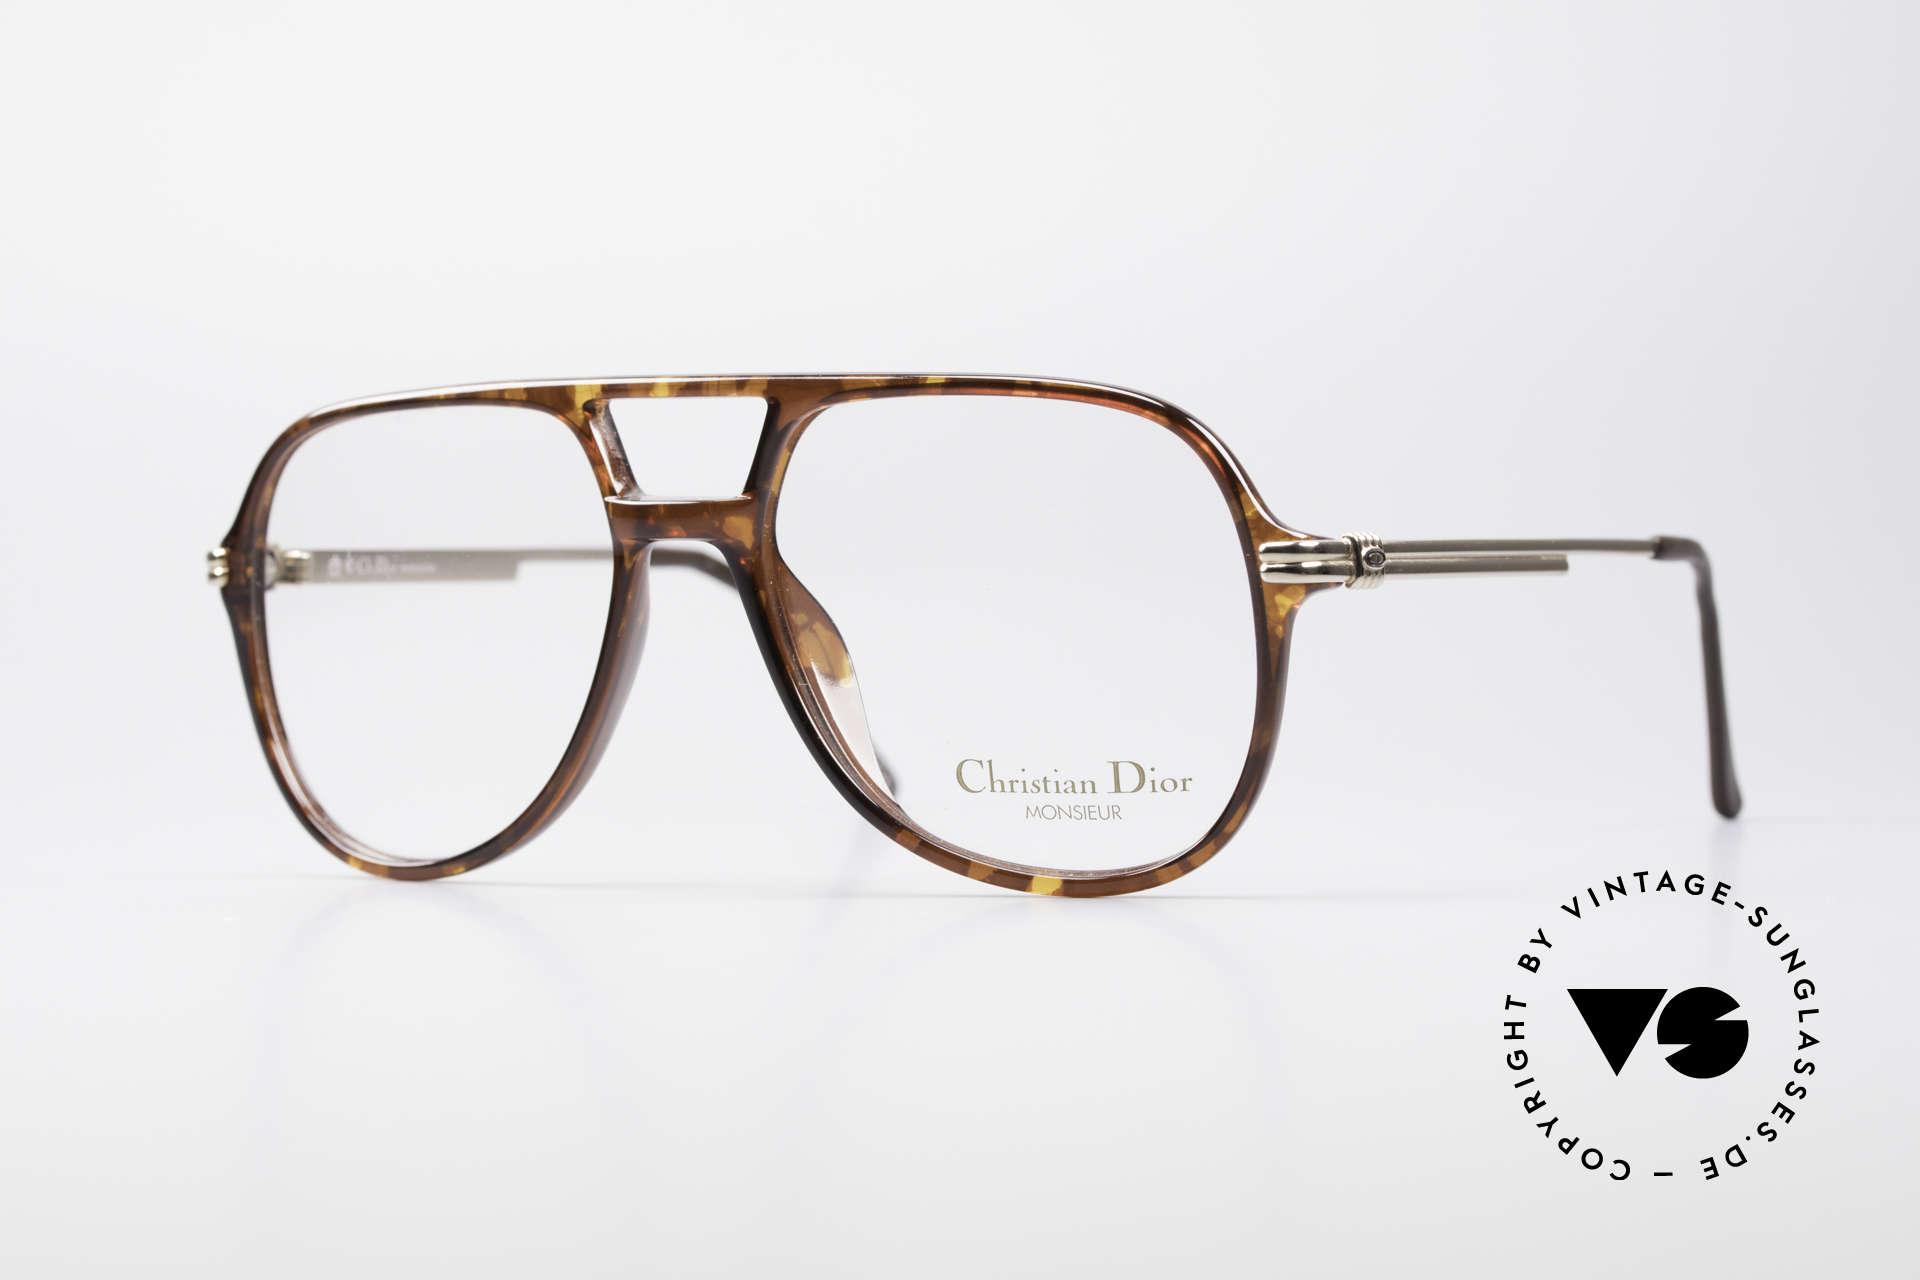 Glasses Christian Dior 2473 80 S Dior Monsieur Eyeglasses